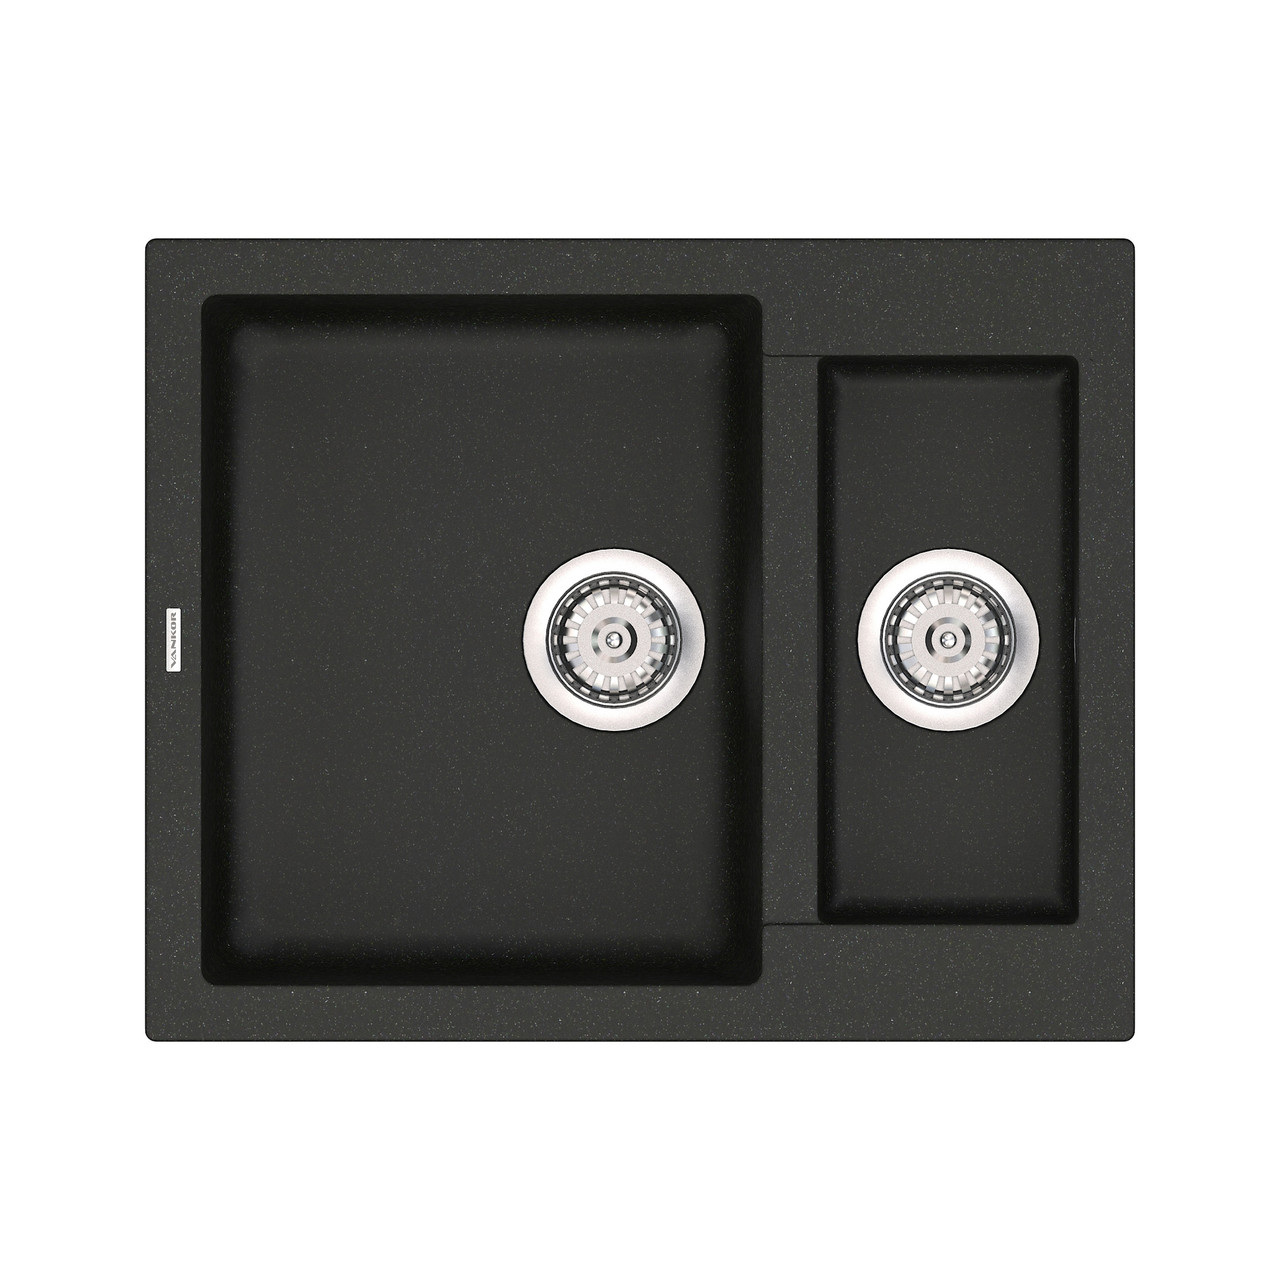 Кухонная мойка гранитная Vankor Orman OMP 03.61 Black 61*50